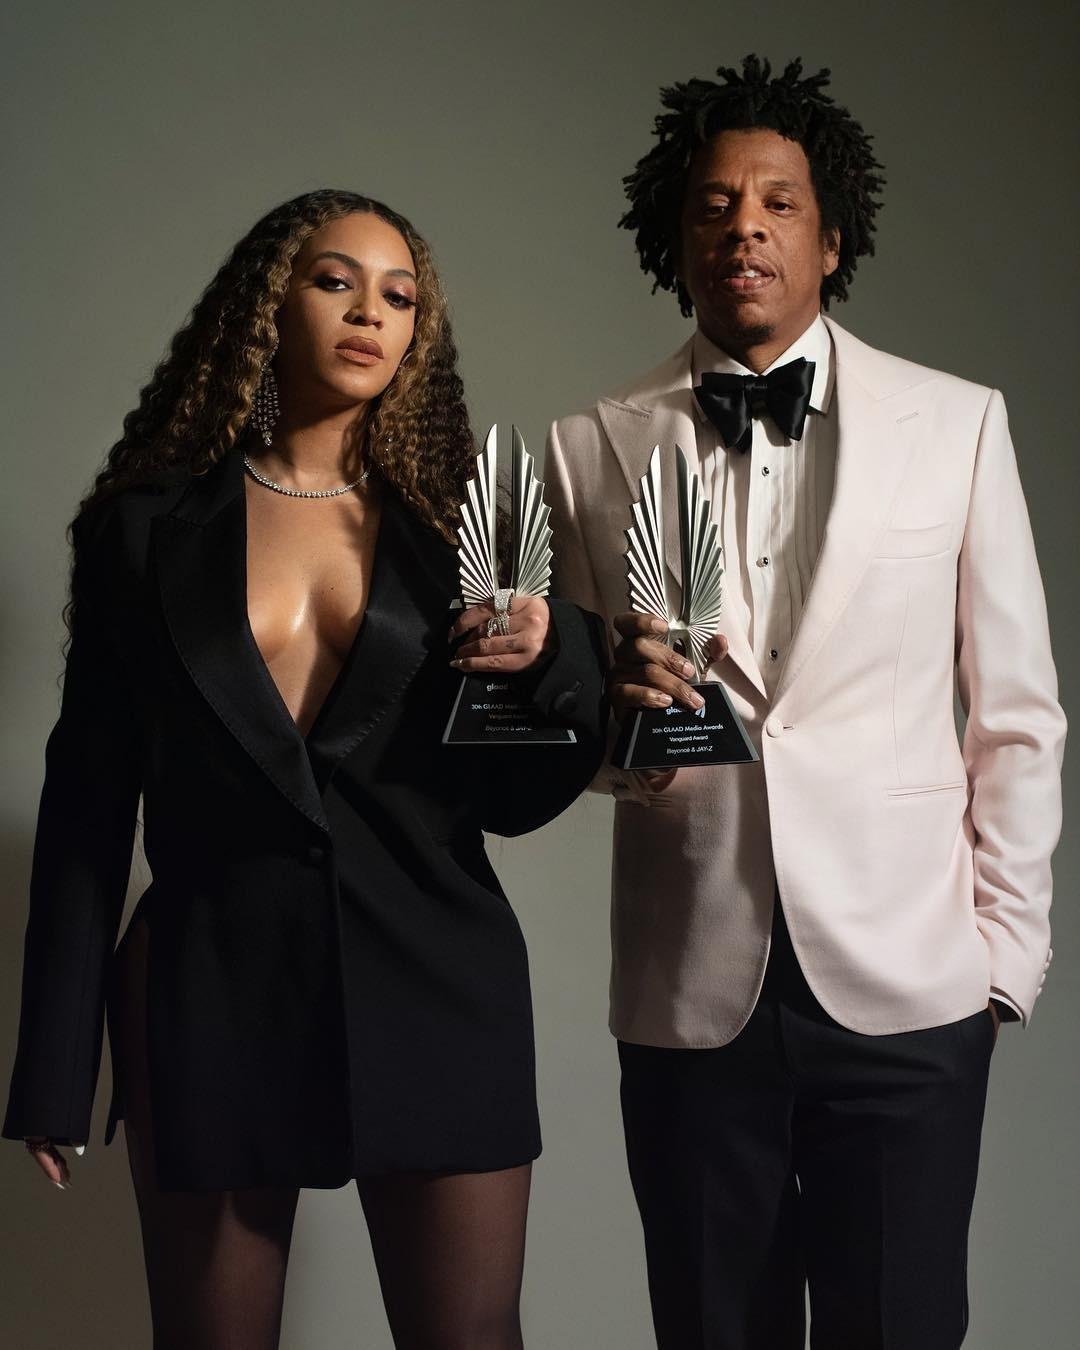 Супруги стали лауреатами 30-й еж&#107...